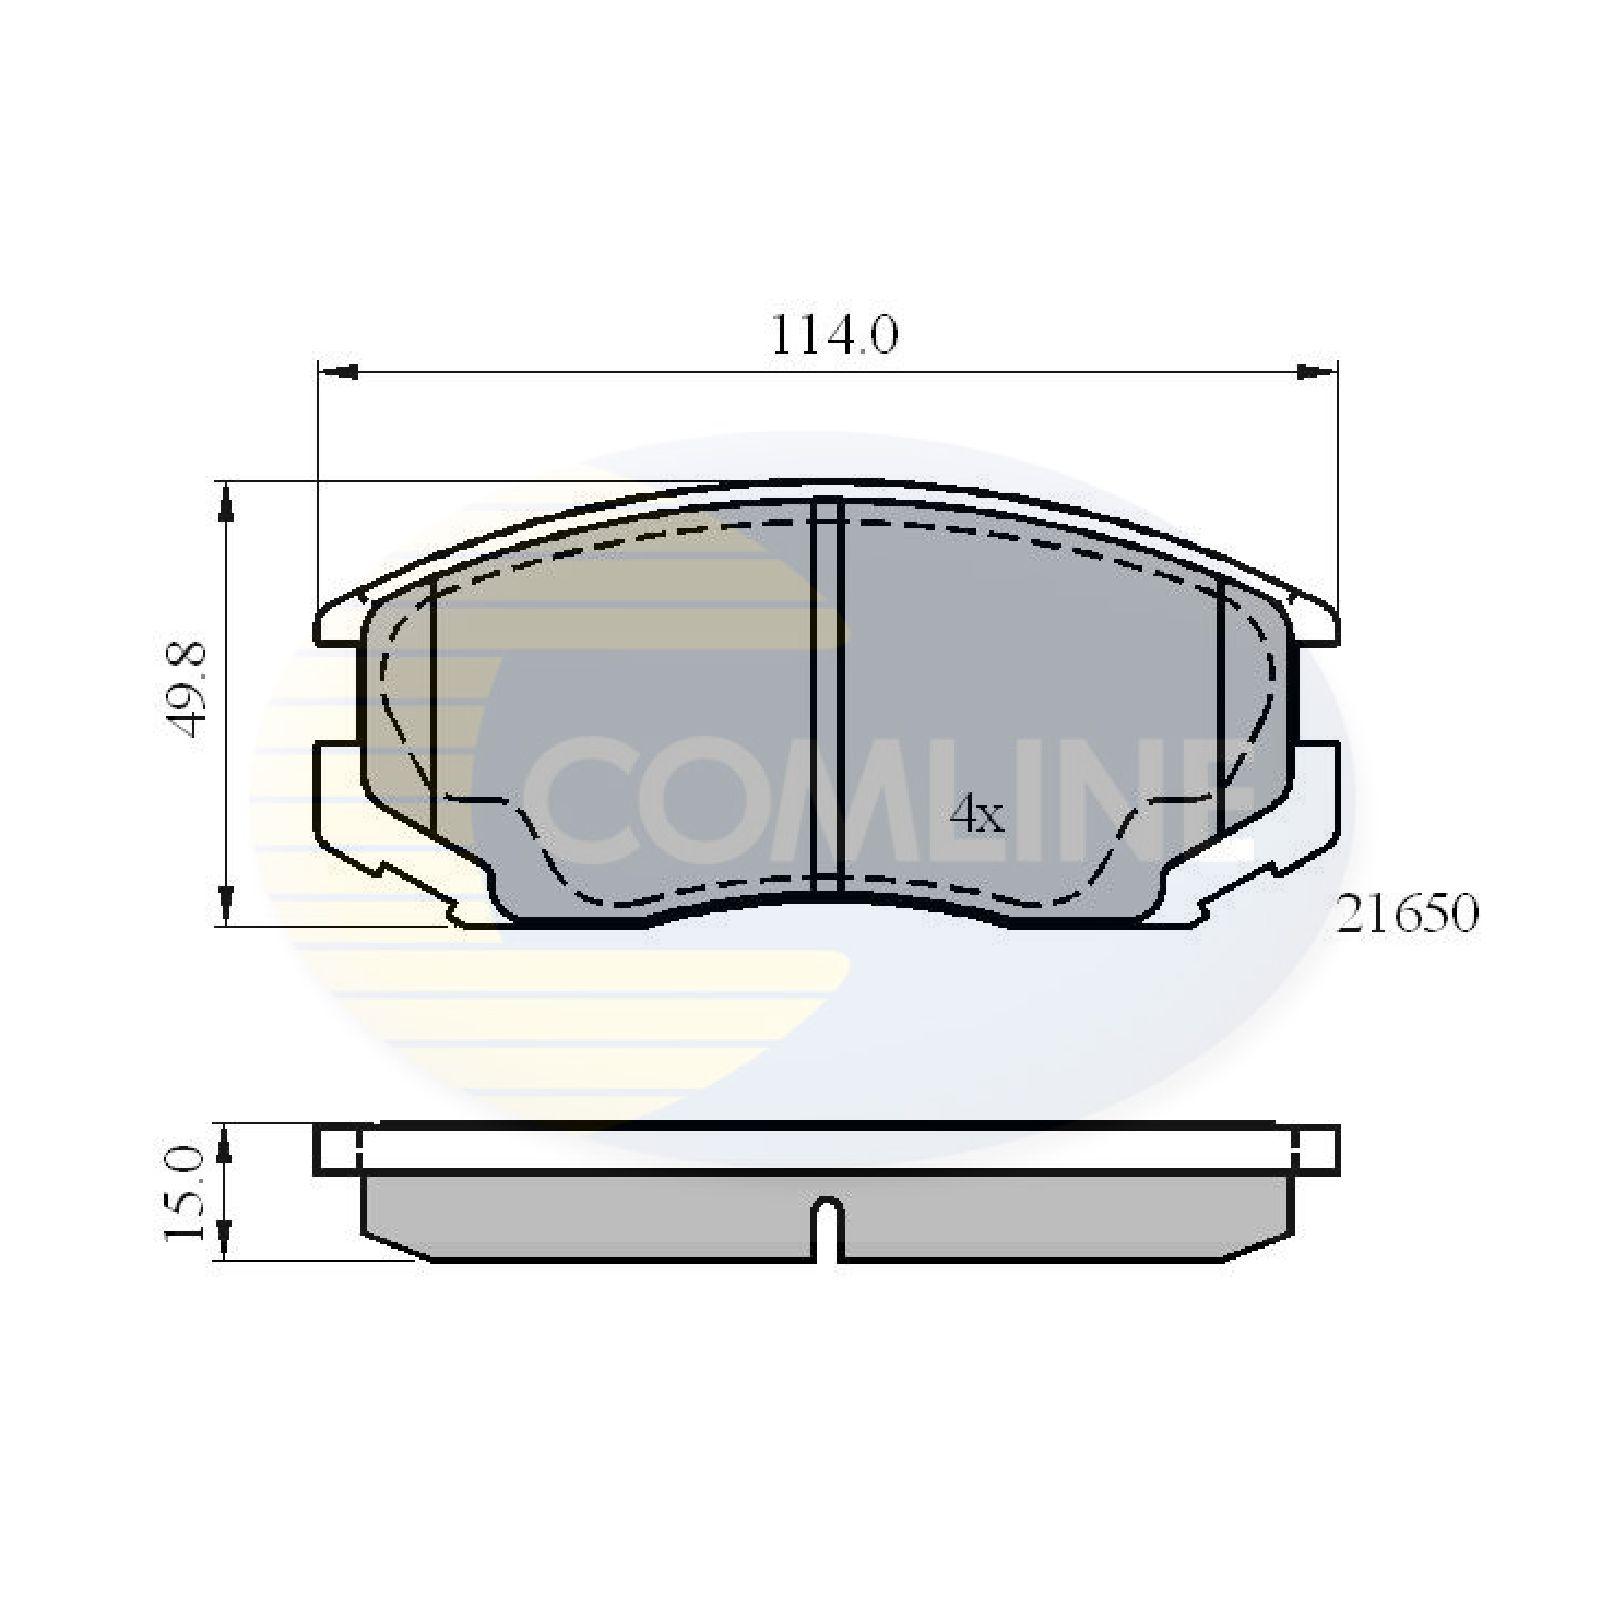 Wiring Diagram 5a Mazda Pin Relay 2006 M35 Fuse Box Wira Image Proton 1 5 Diagrams And